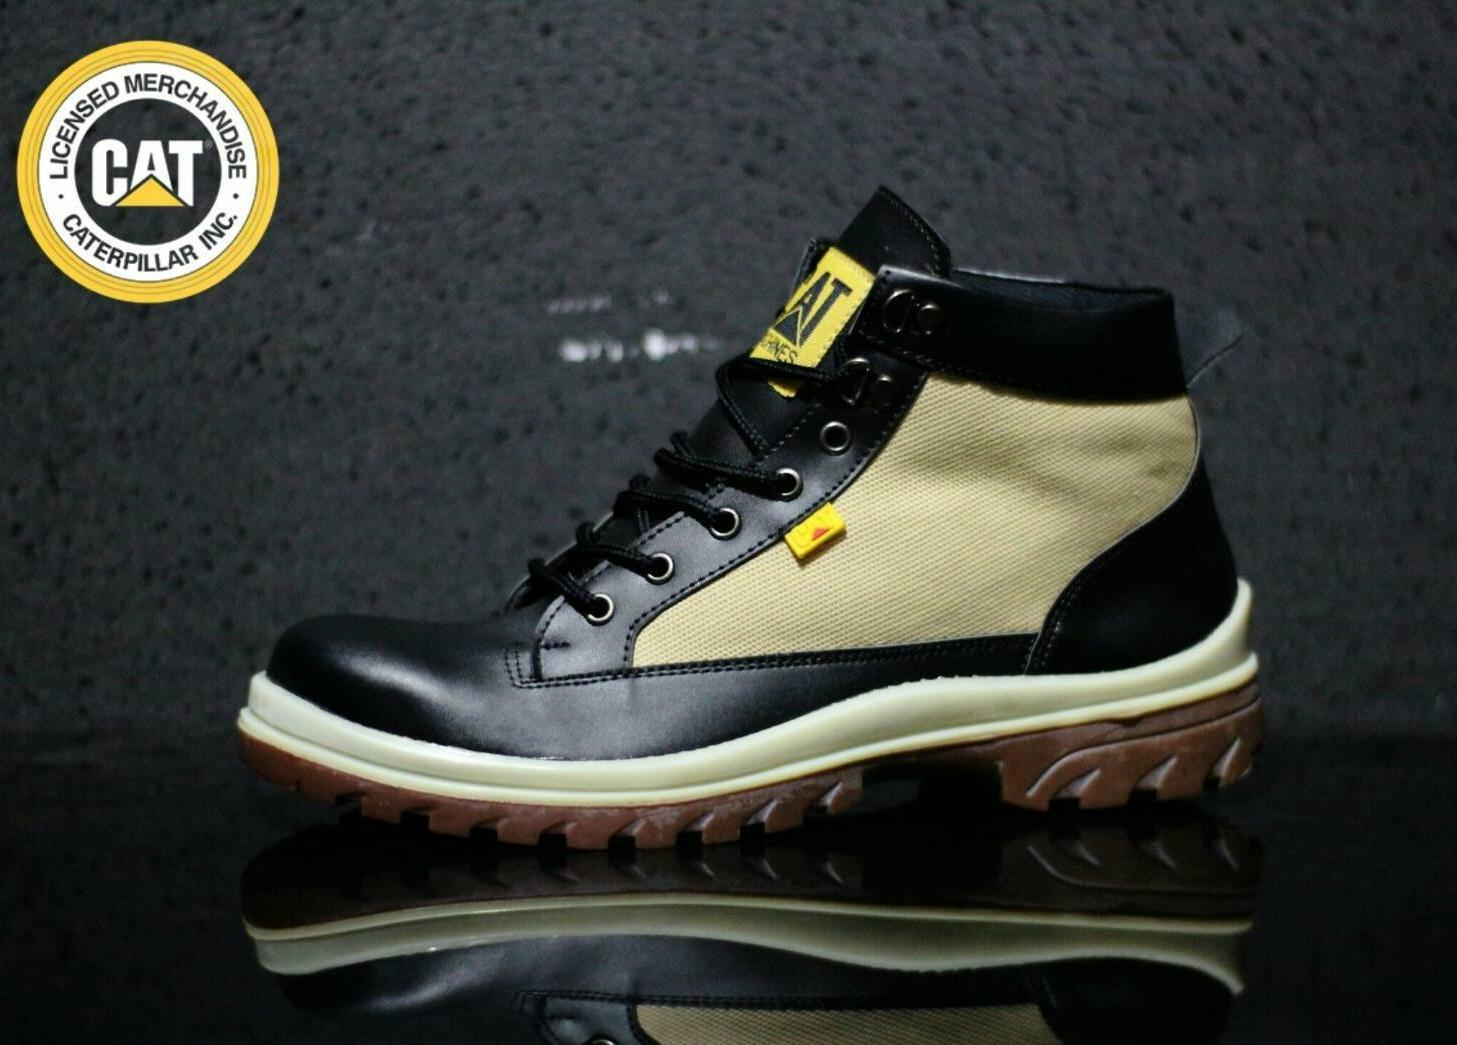 Sepatu Boots Safety Gaya Pria Sneakers Kerja Kantoran Pormal Touring Sport Sekolah Kuliahan Vans Converse Pantofel Hitam